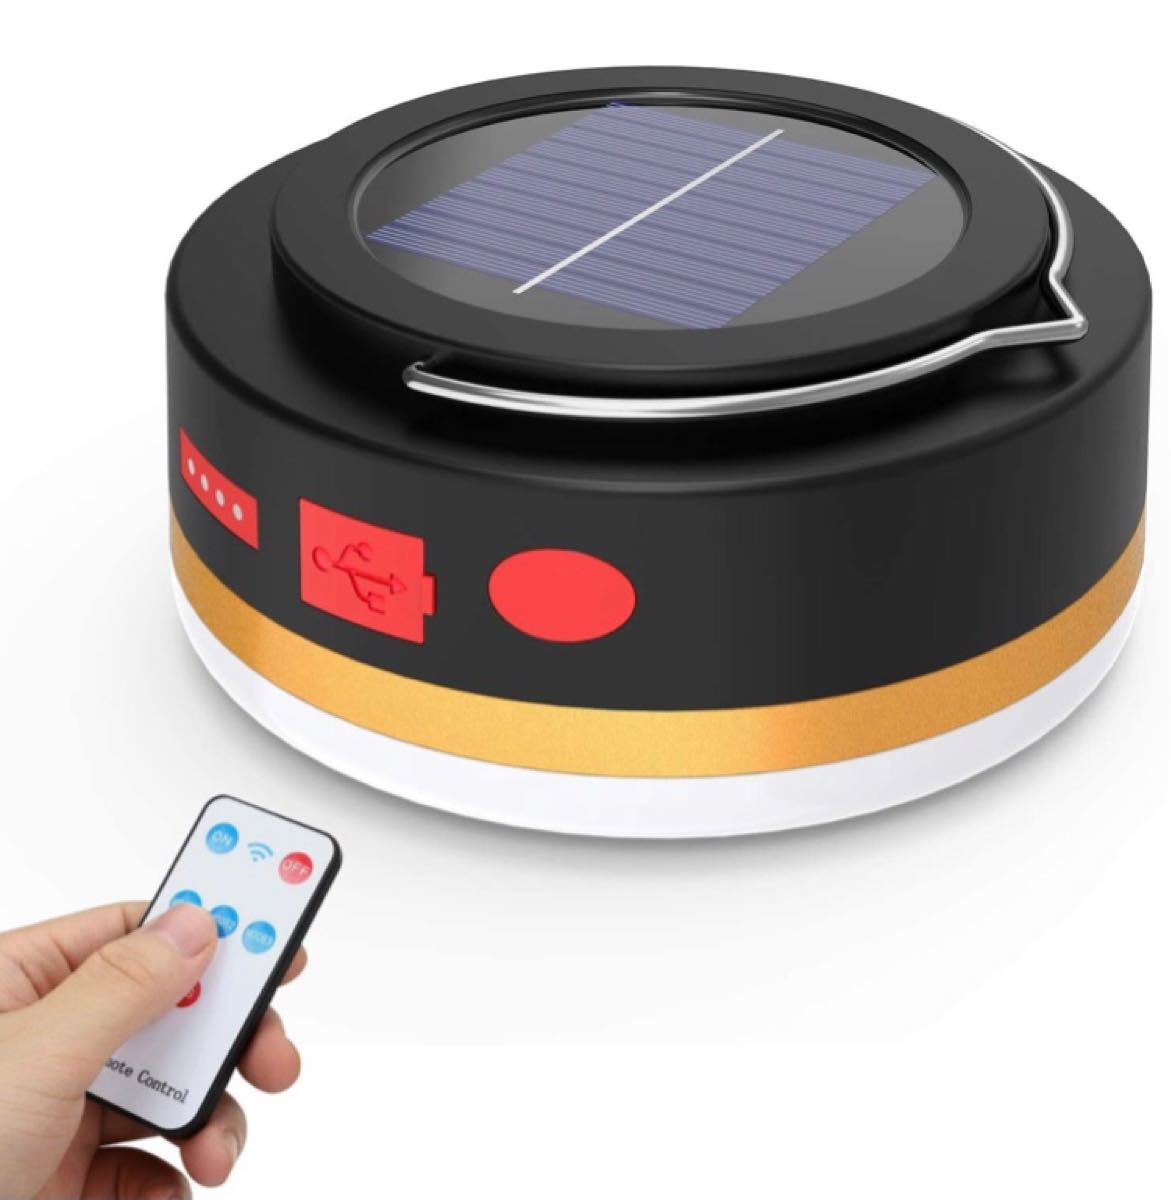 LEDランタン 高輝度 キャンプランタン 5つ点灯モード usb充電式 ソーラー充電 テントライト 4400aMh大容量防災ライト